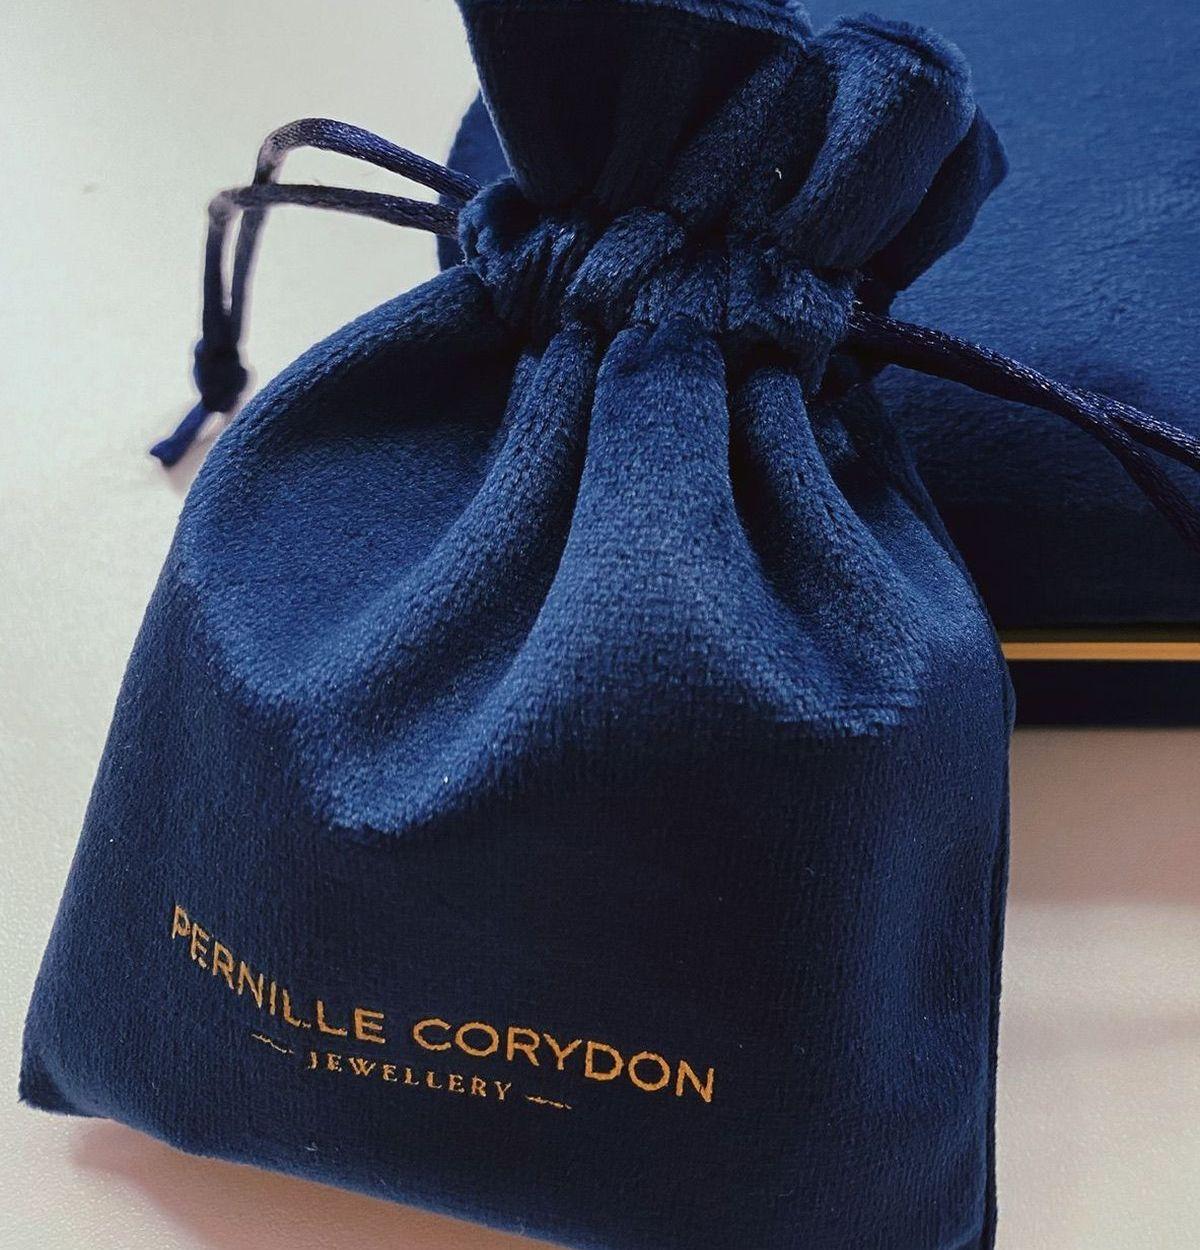 Pernille Corydon Jewellery